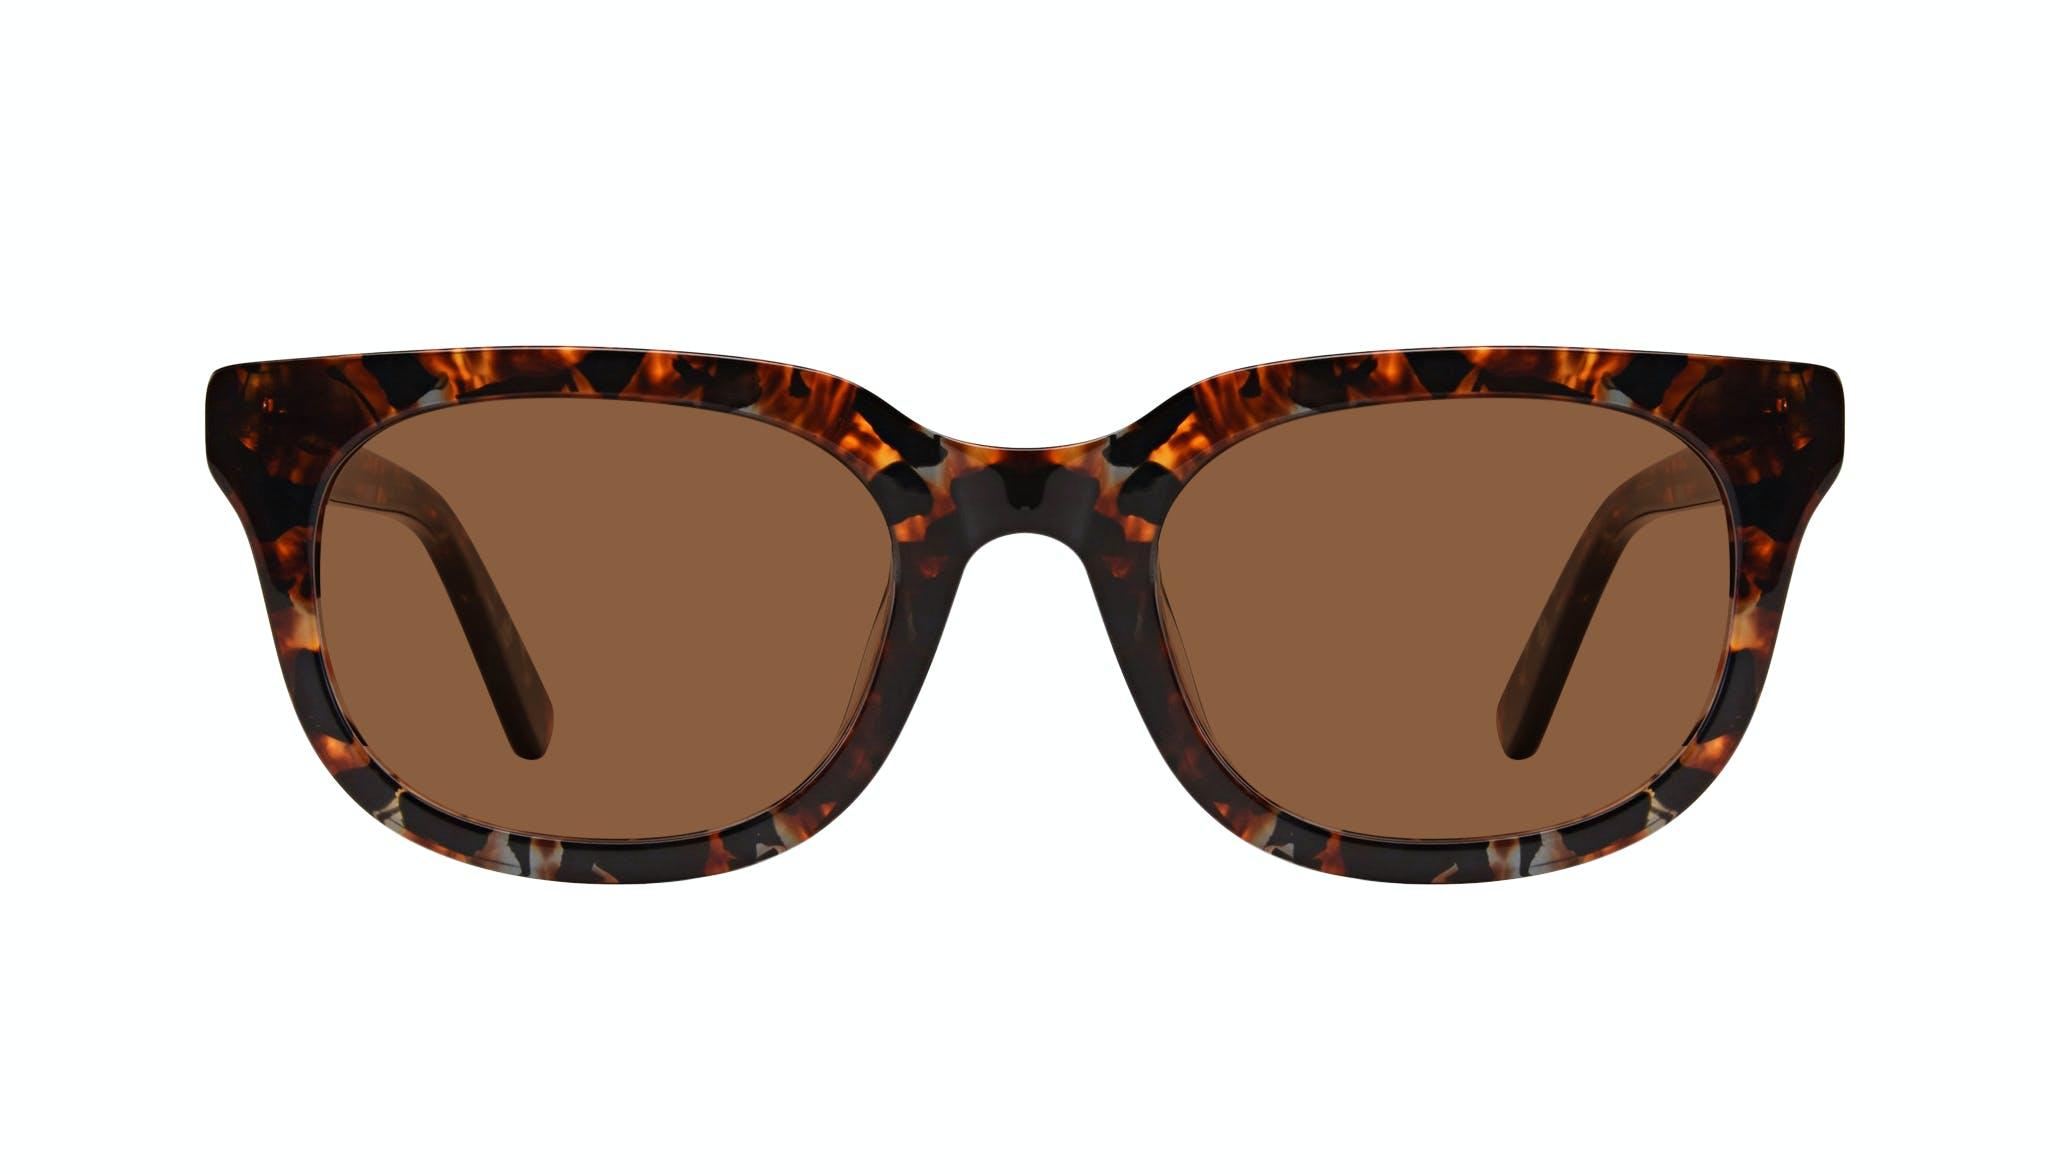 Affordable Fashion Glasses Square Sunglasses Men Stout Mahogany Front